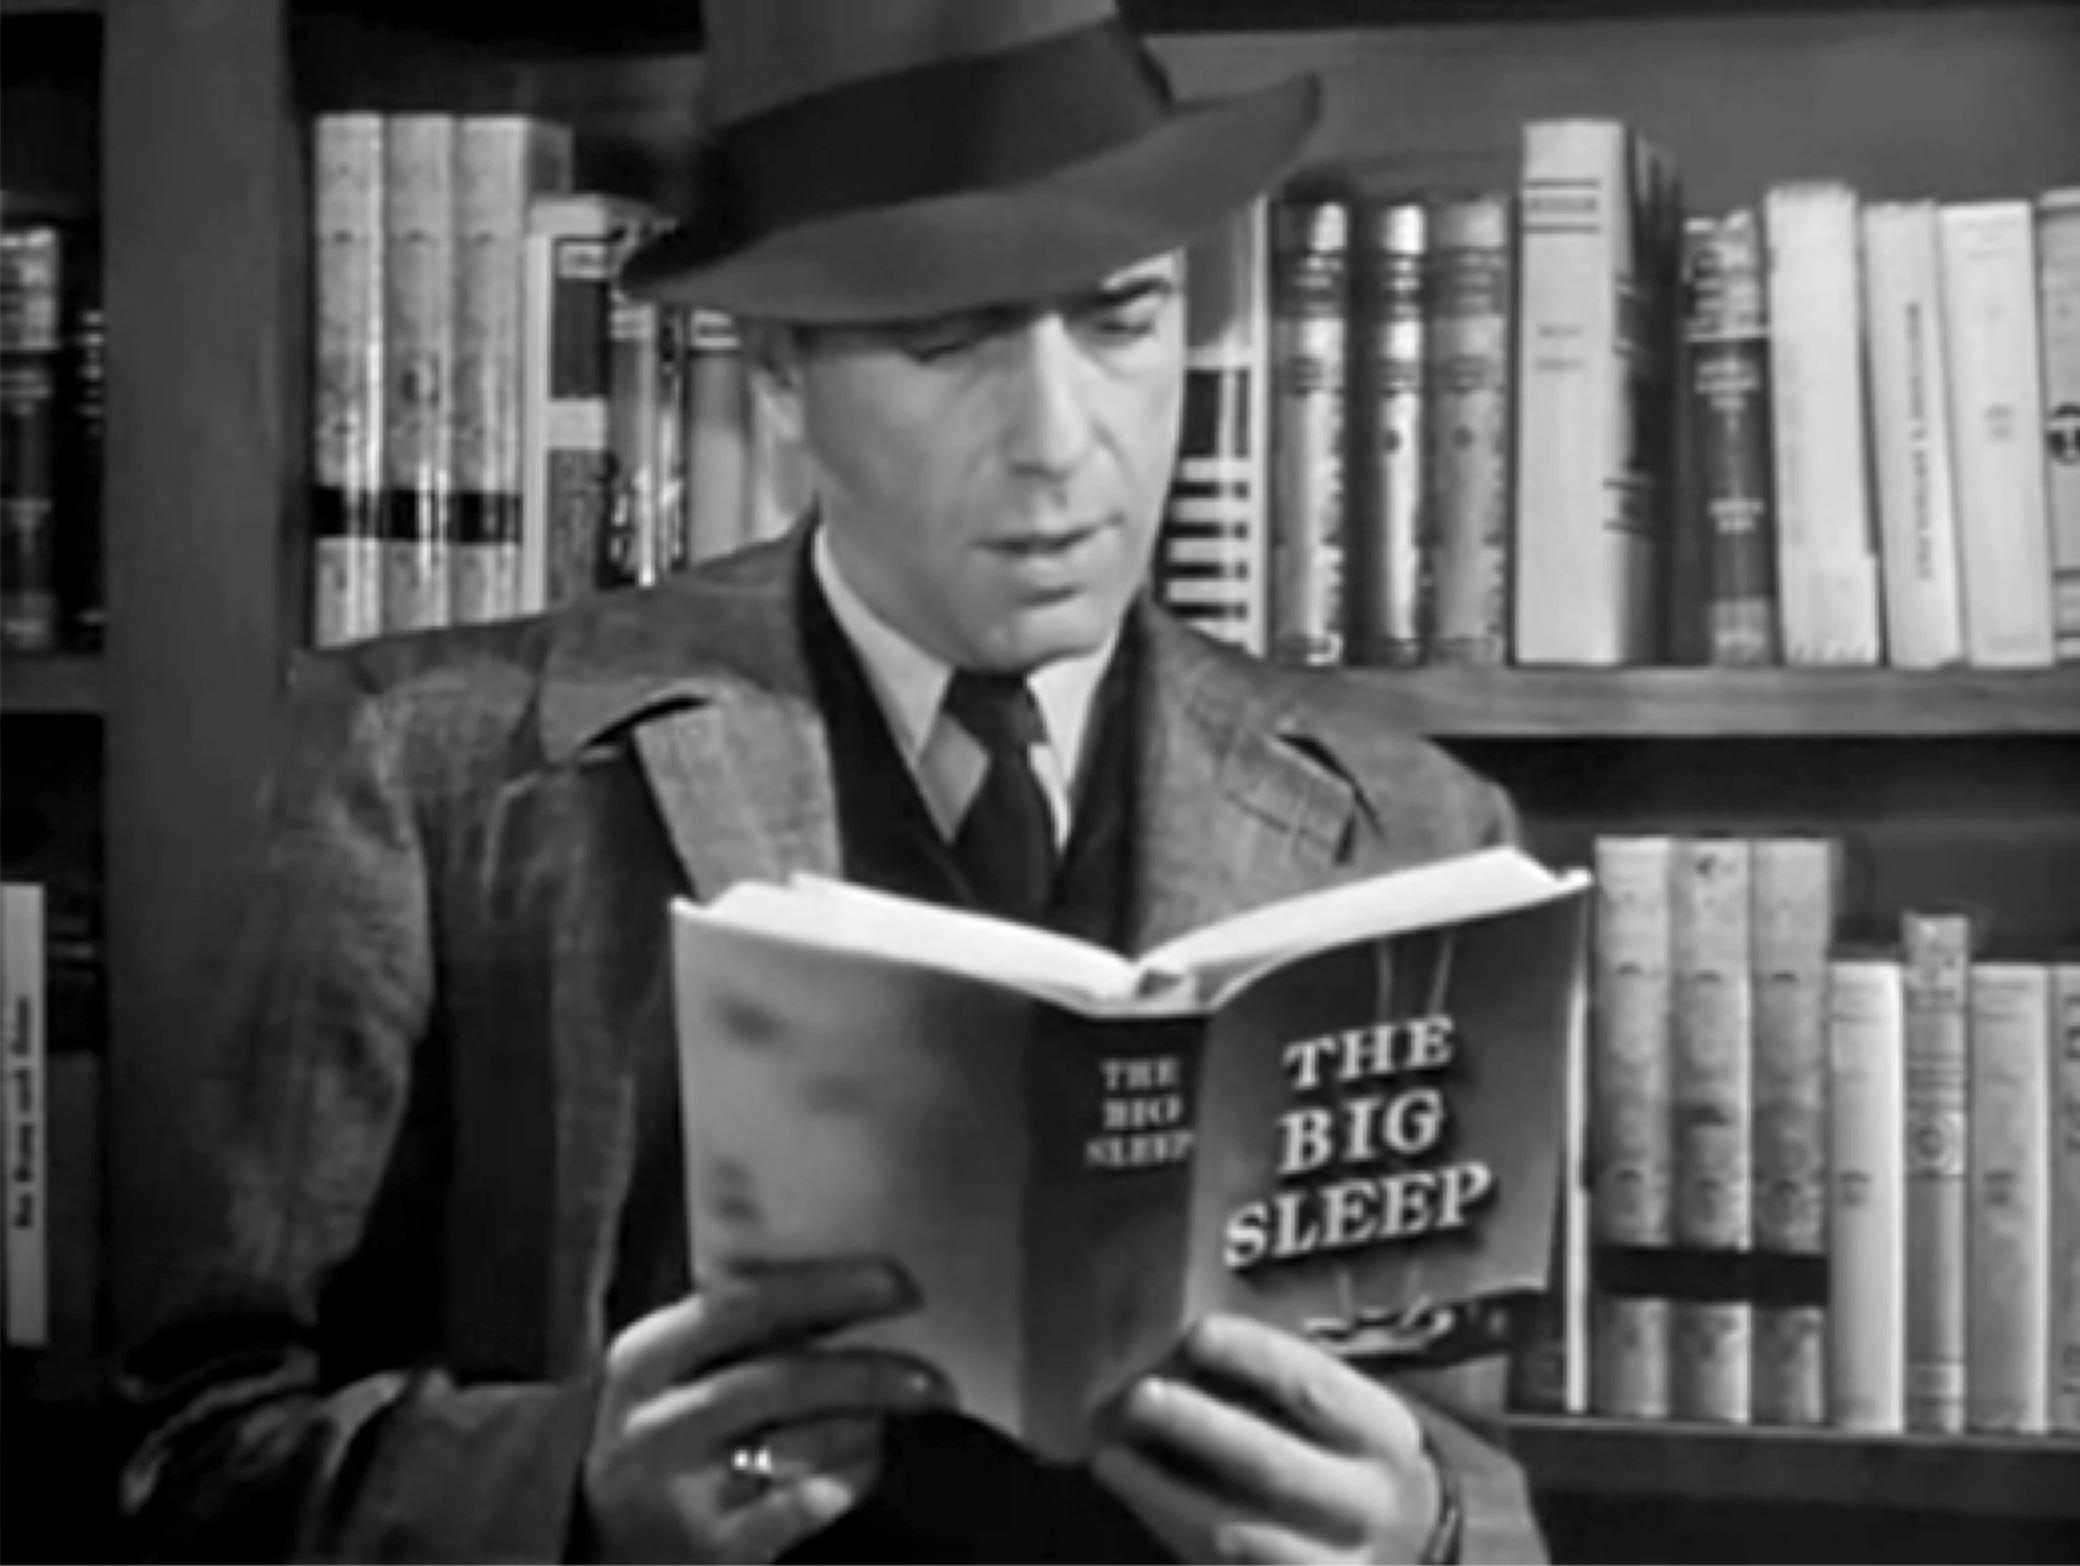 The-Big-Sleep-trailer-book.jpg